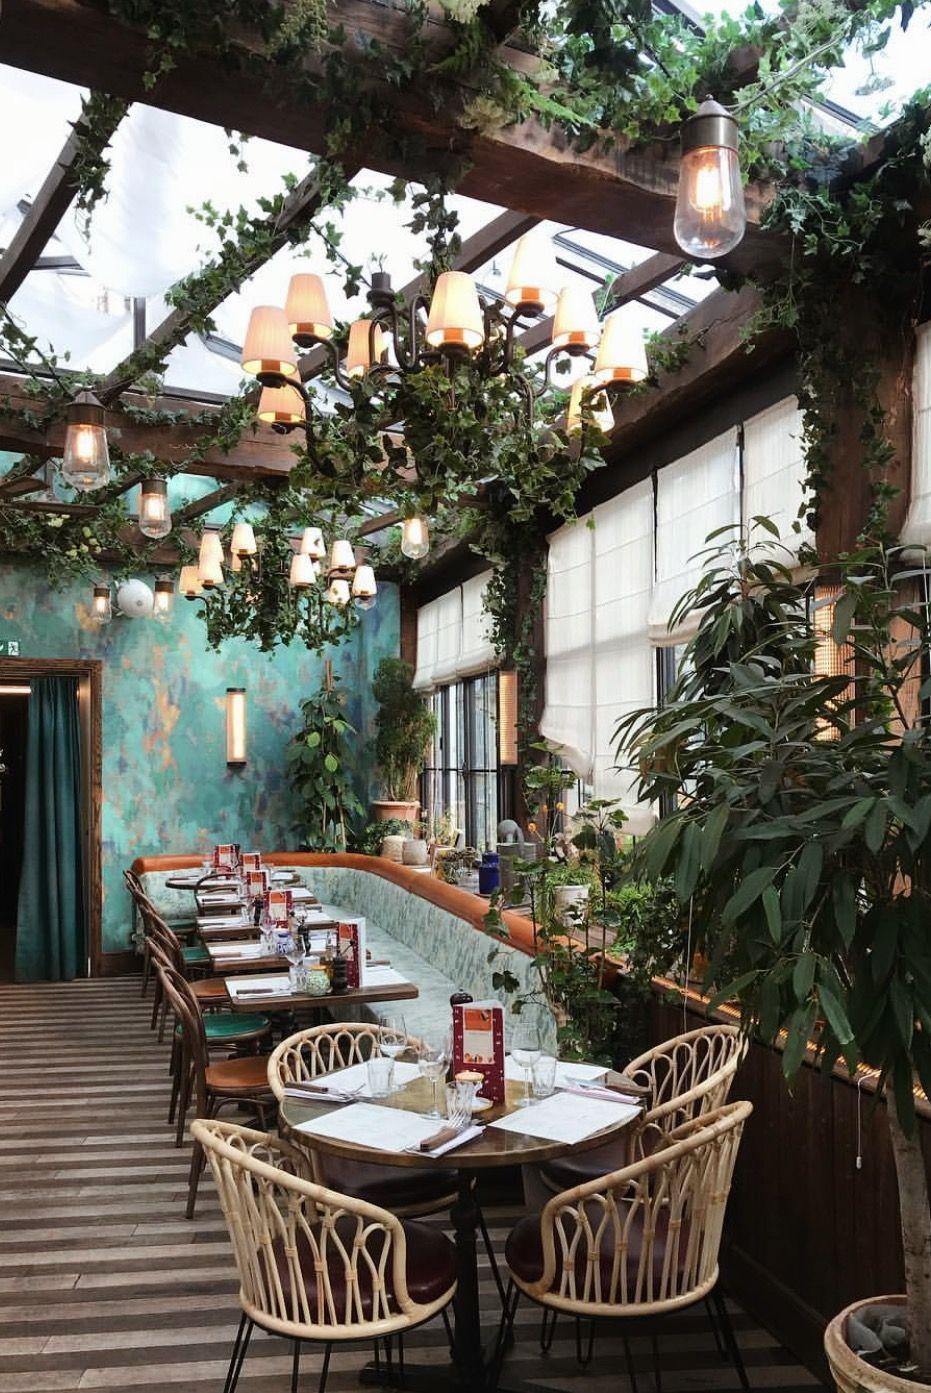 The Most Beautiful Restaurants In Paris Outdoor Restaurant Design Cafe Interior Design Outdoor Restaurant